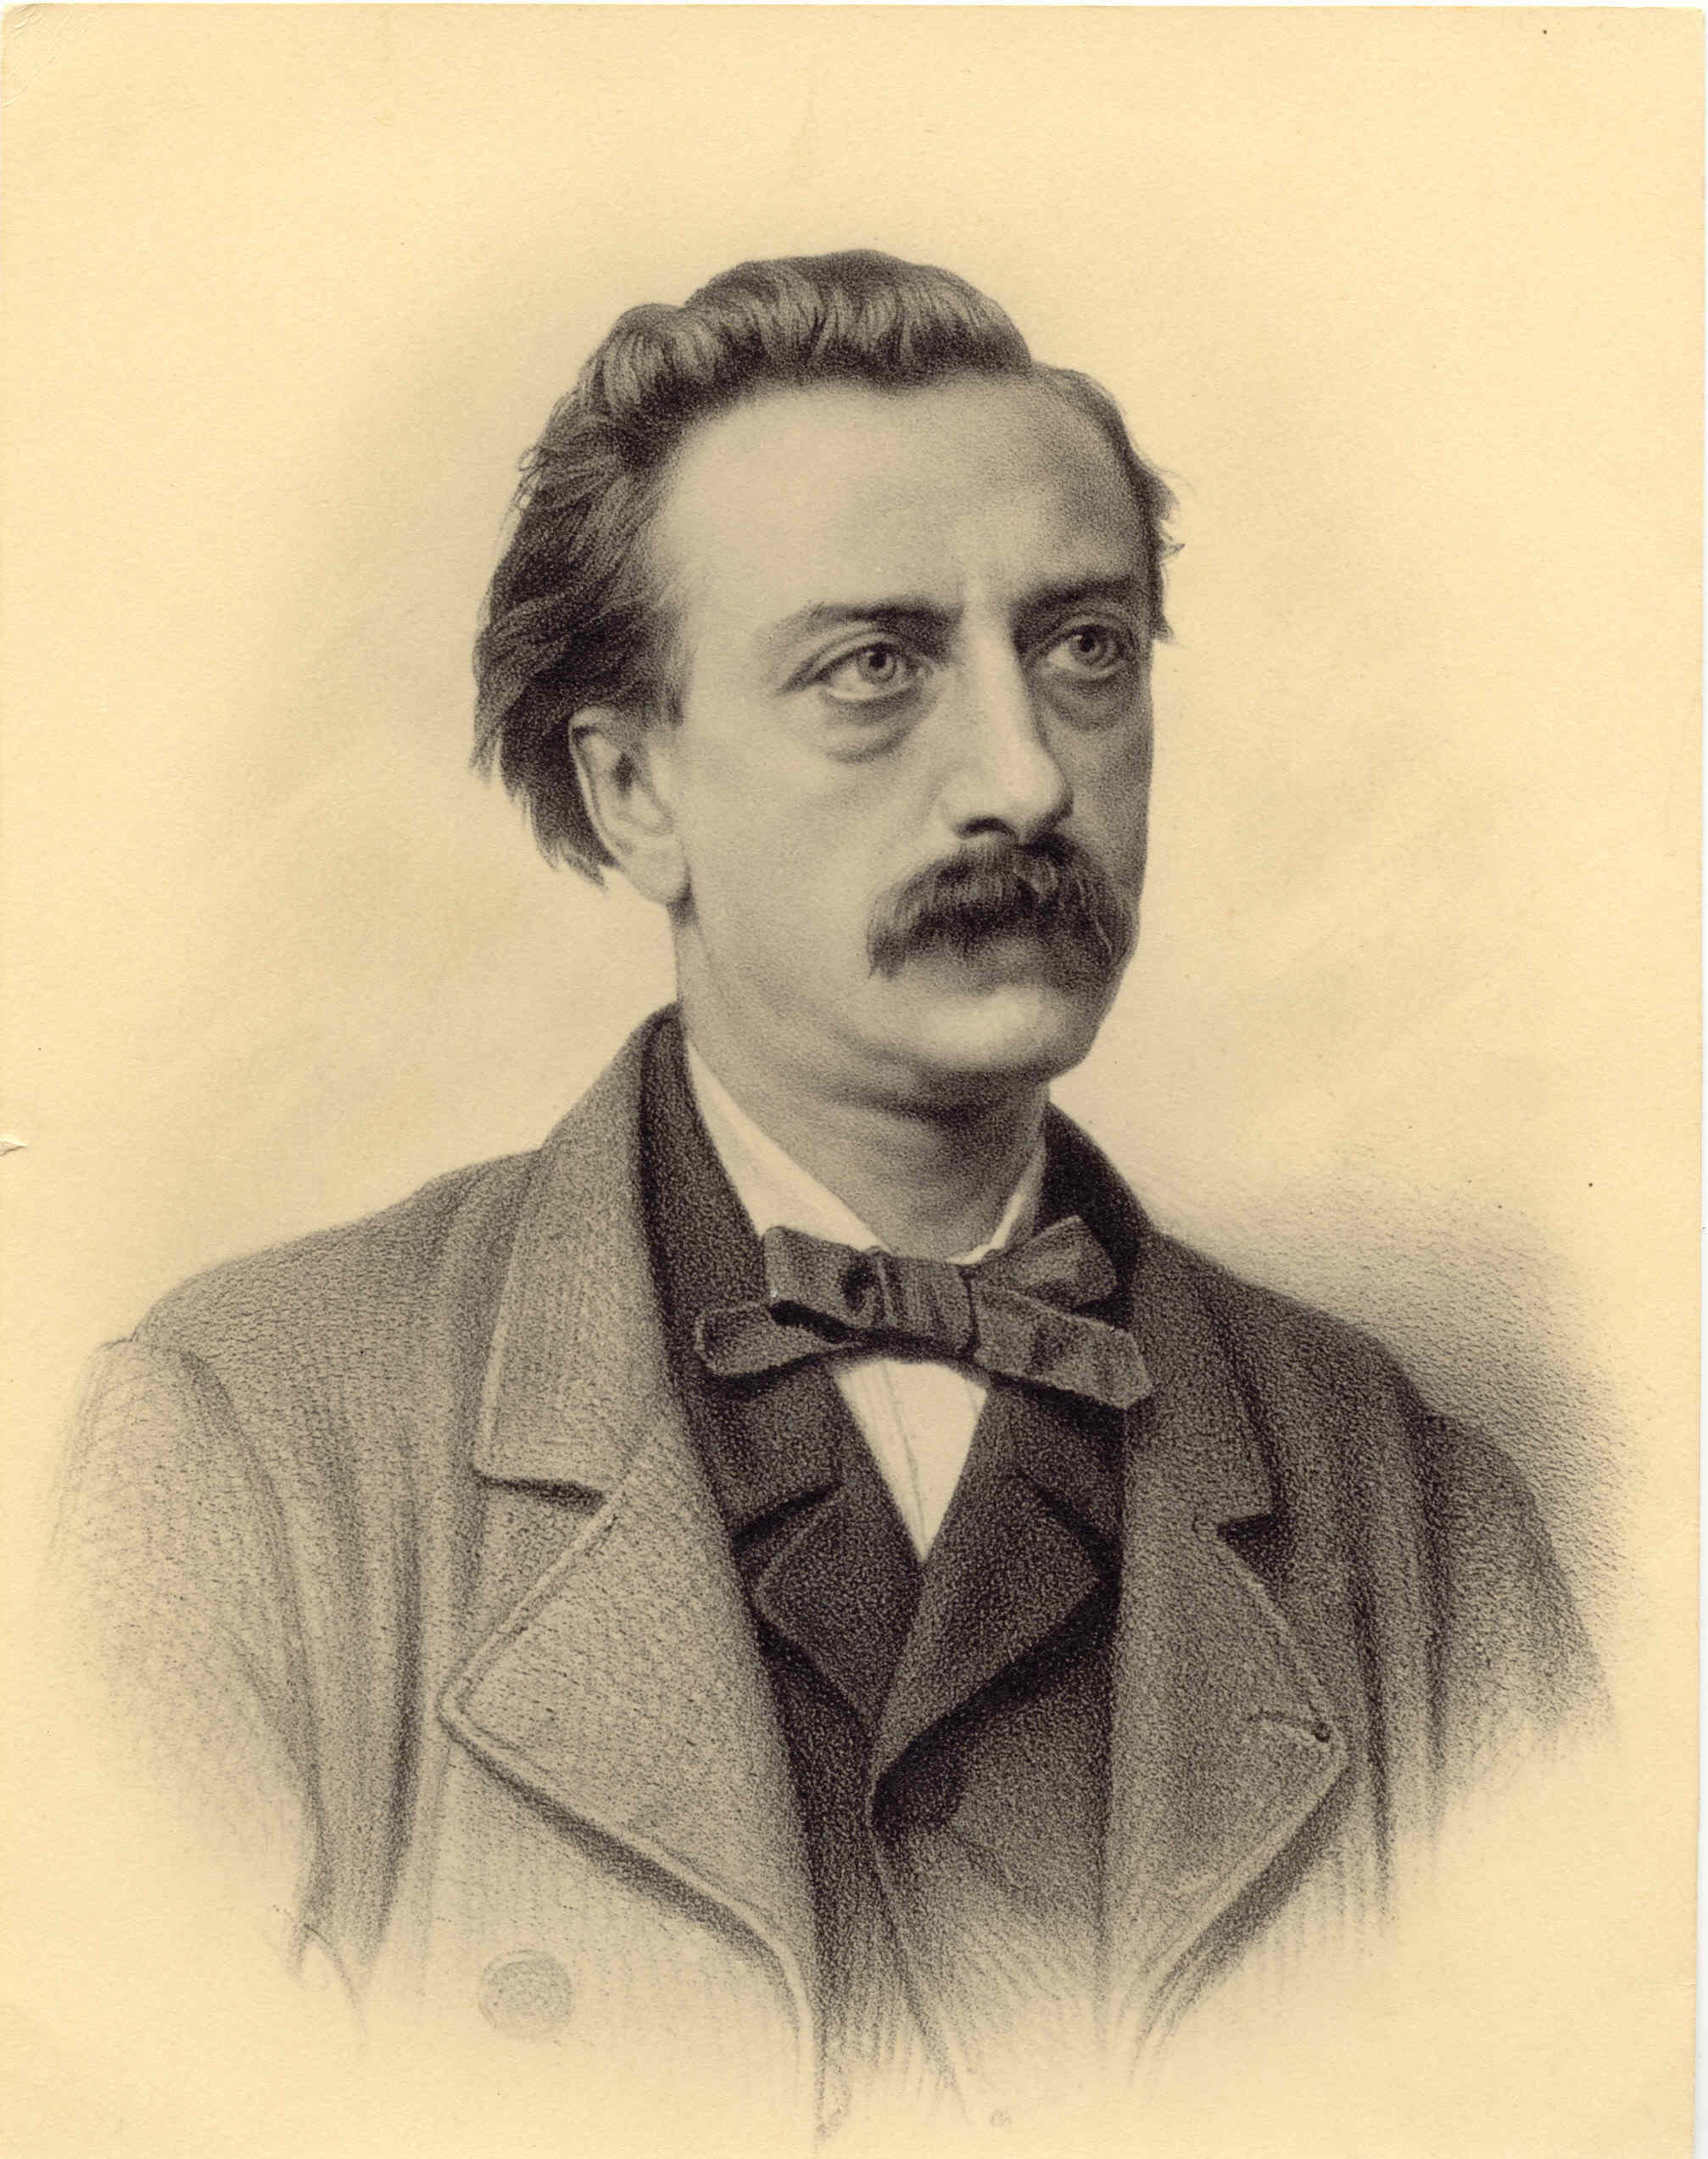 Multatuli, Mitkiewicz (1864)